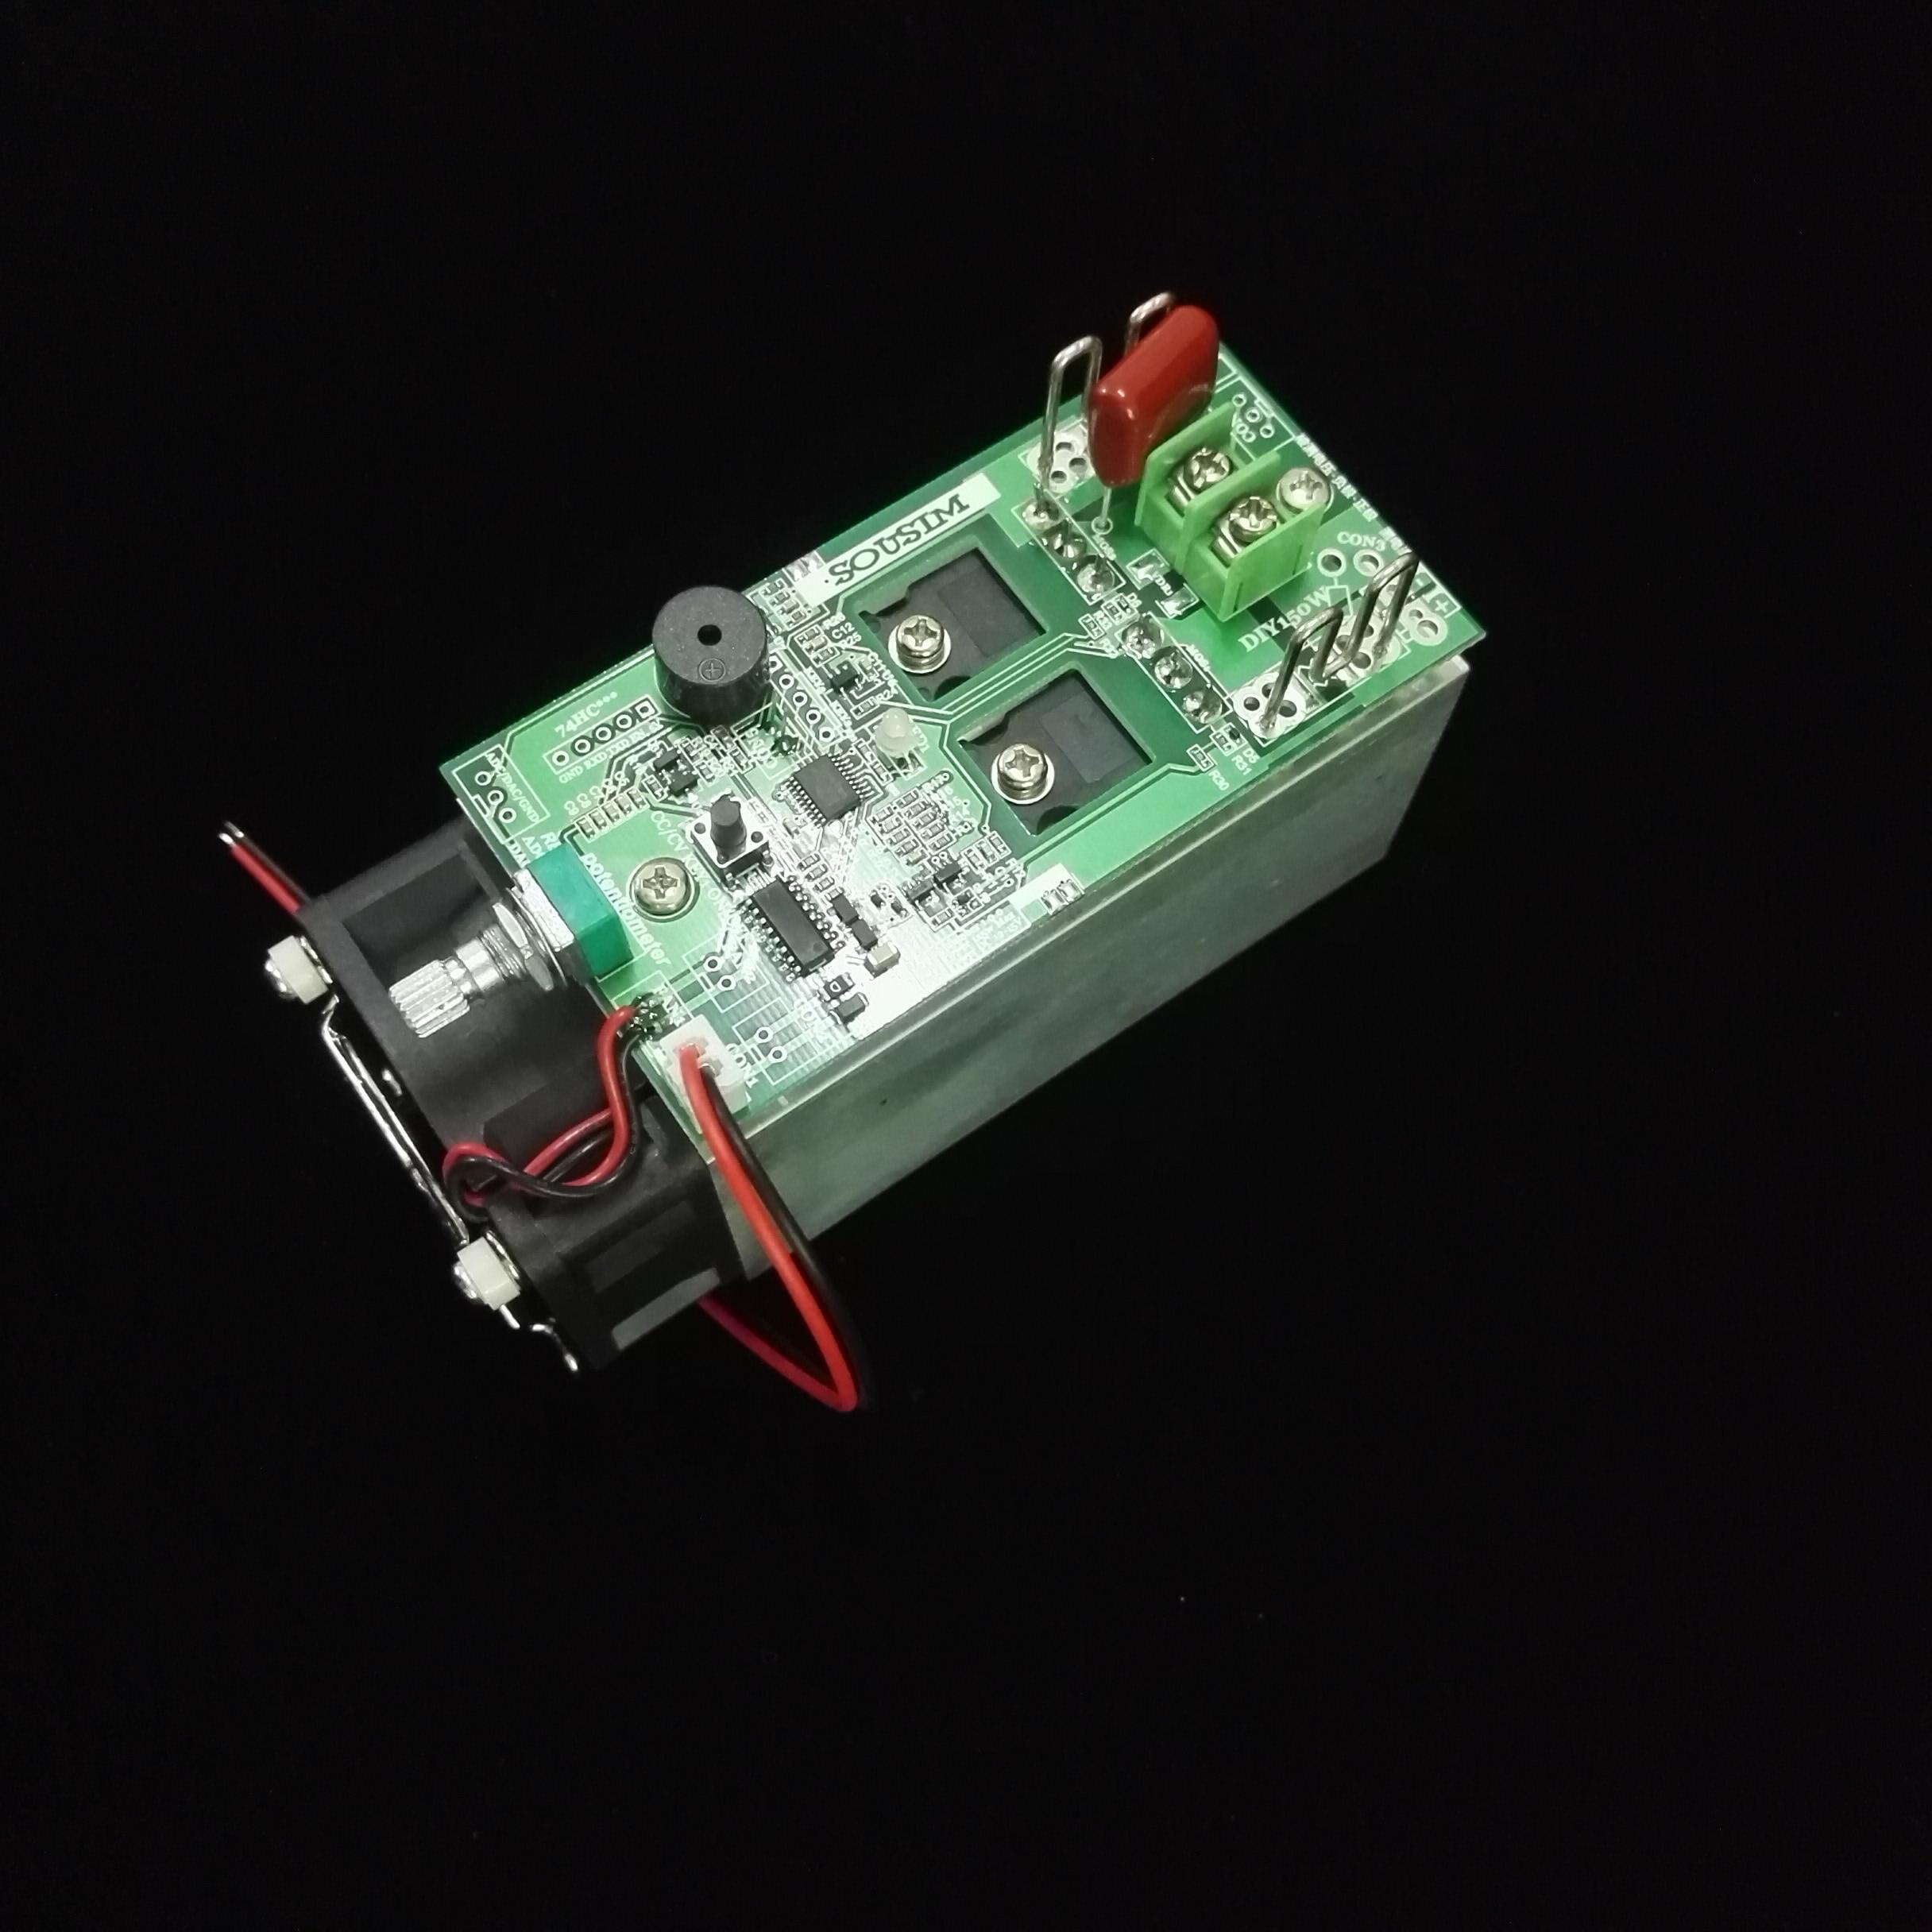 Adjustable Load Electronic Constant Voltage Current For More Detail Circuit Provides Constantcurrent Testing Resistance Substitutes Diy150w Standard Version